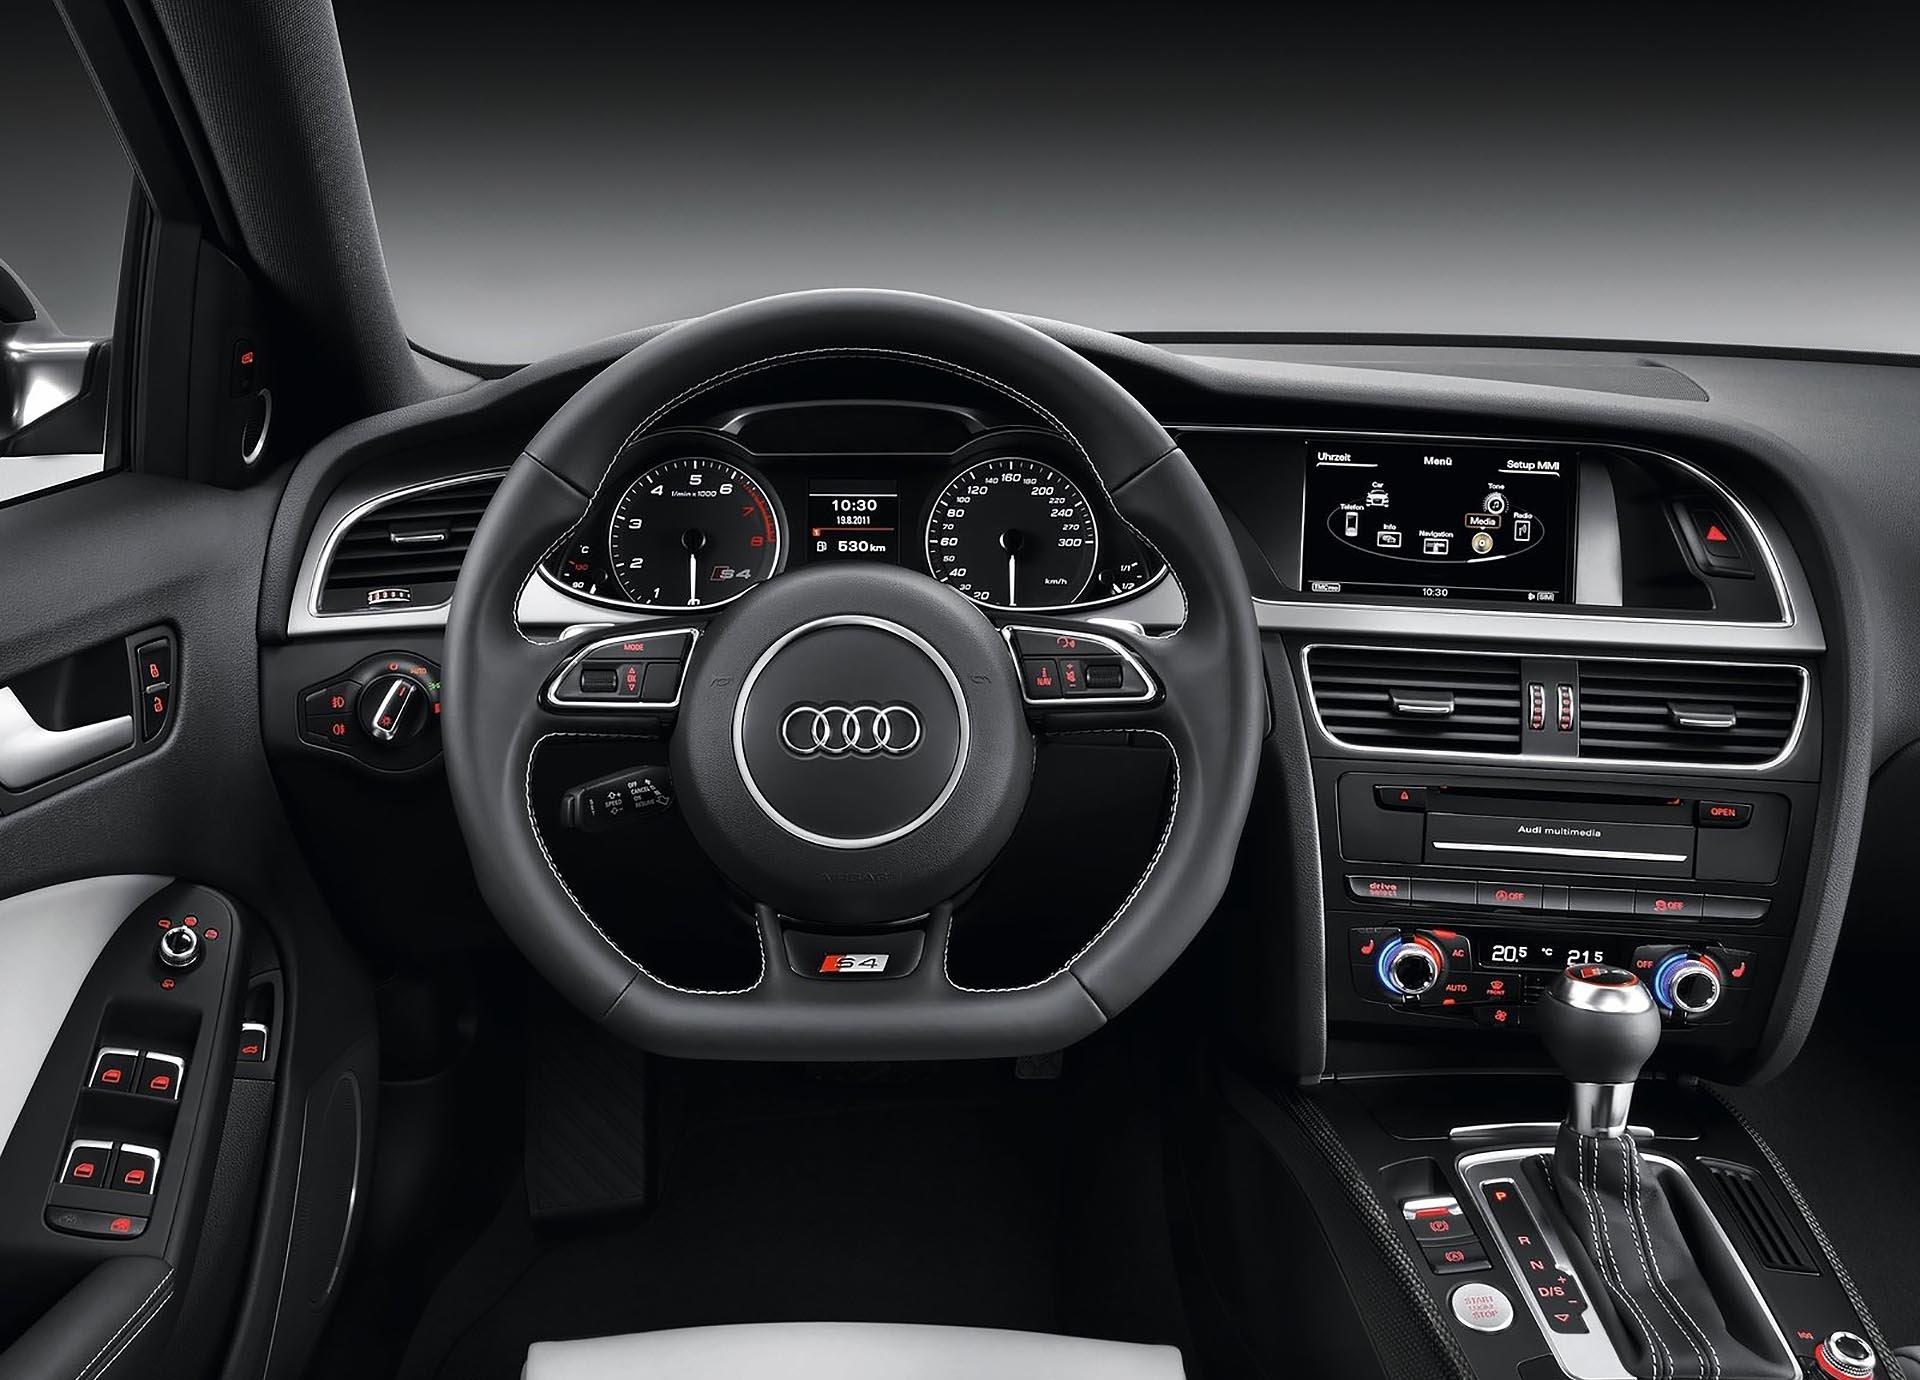 07_B8.5 Audi S4 interior silver carbon fiber trim cockpit